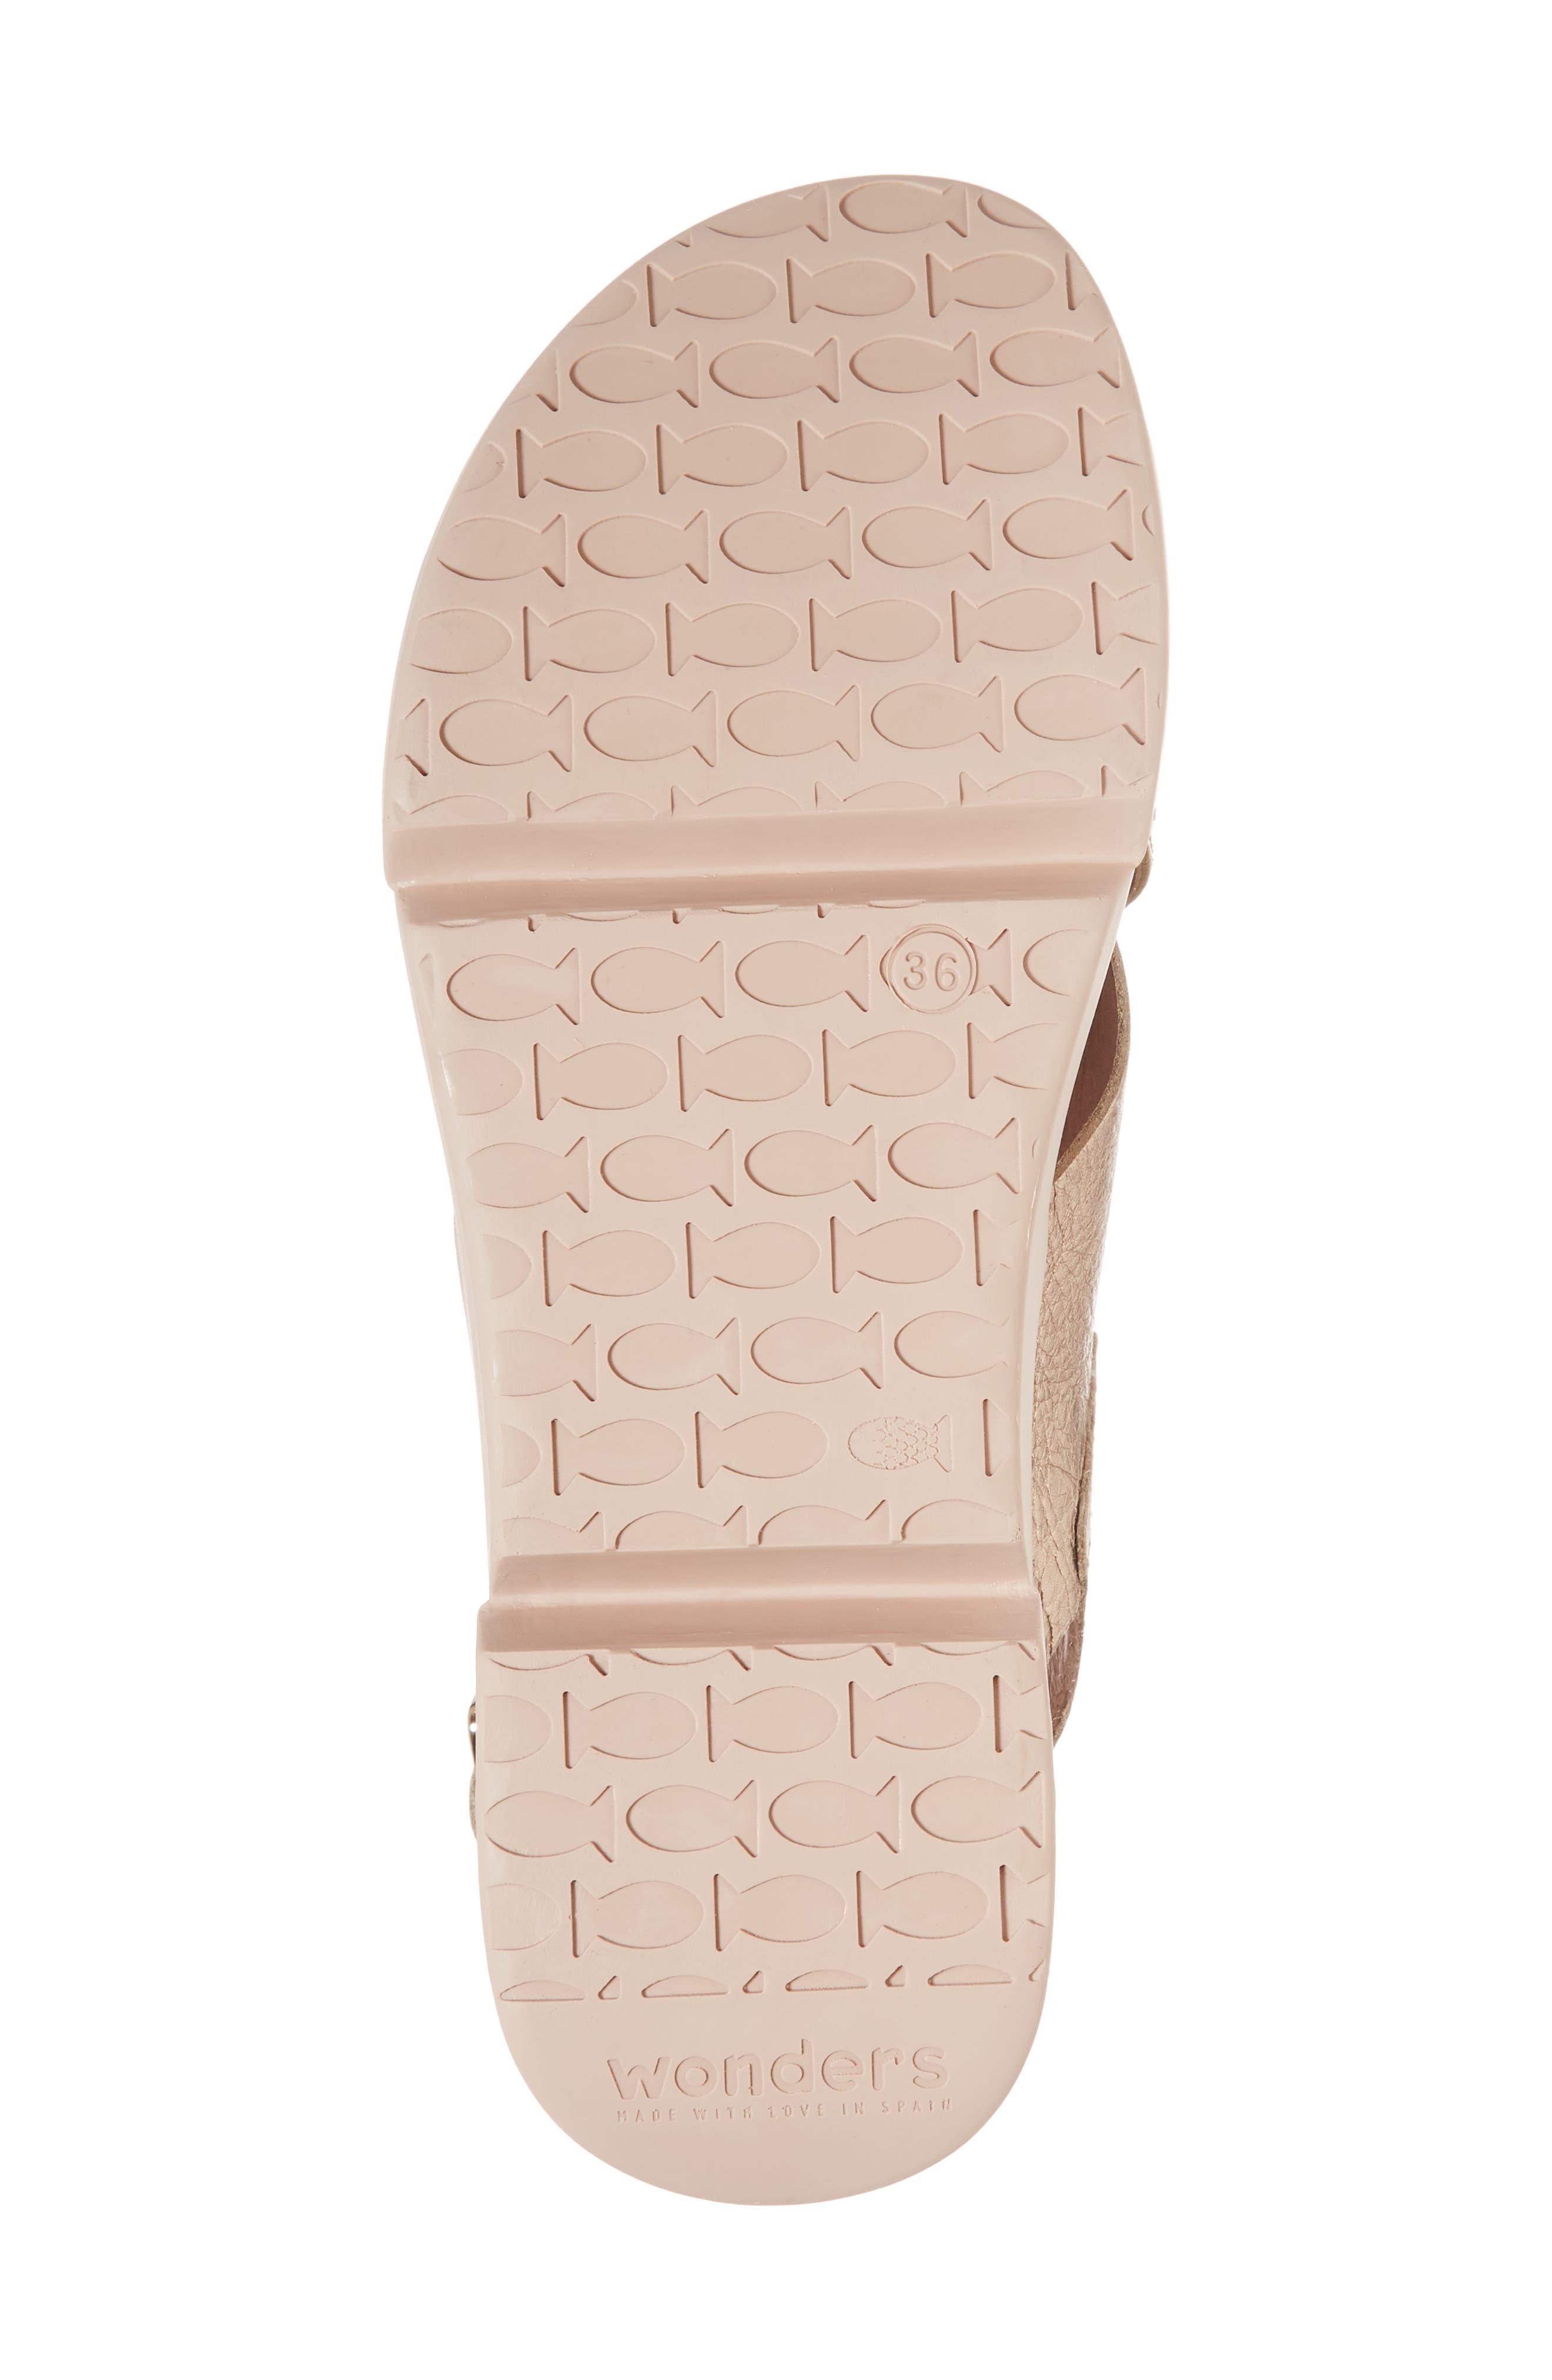 Platform Wedge Sandal,                             Alternate thumbnail 6, color,                             Oro/ Taupe Leather